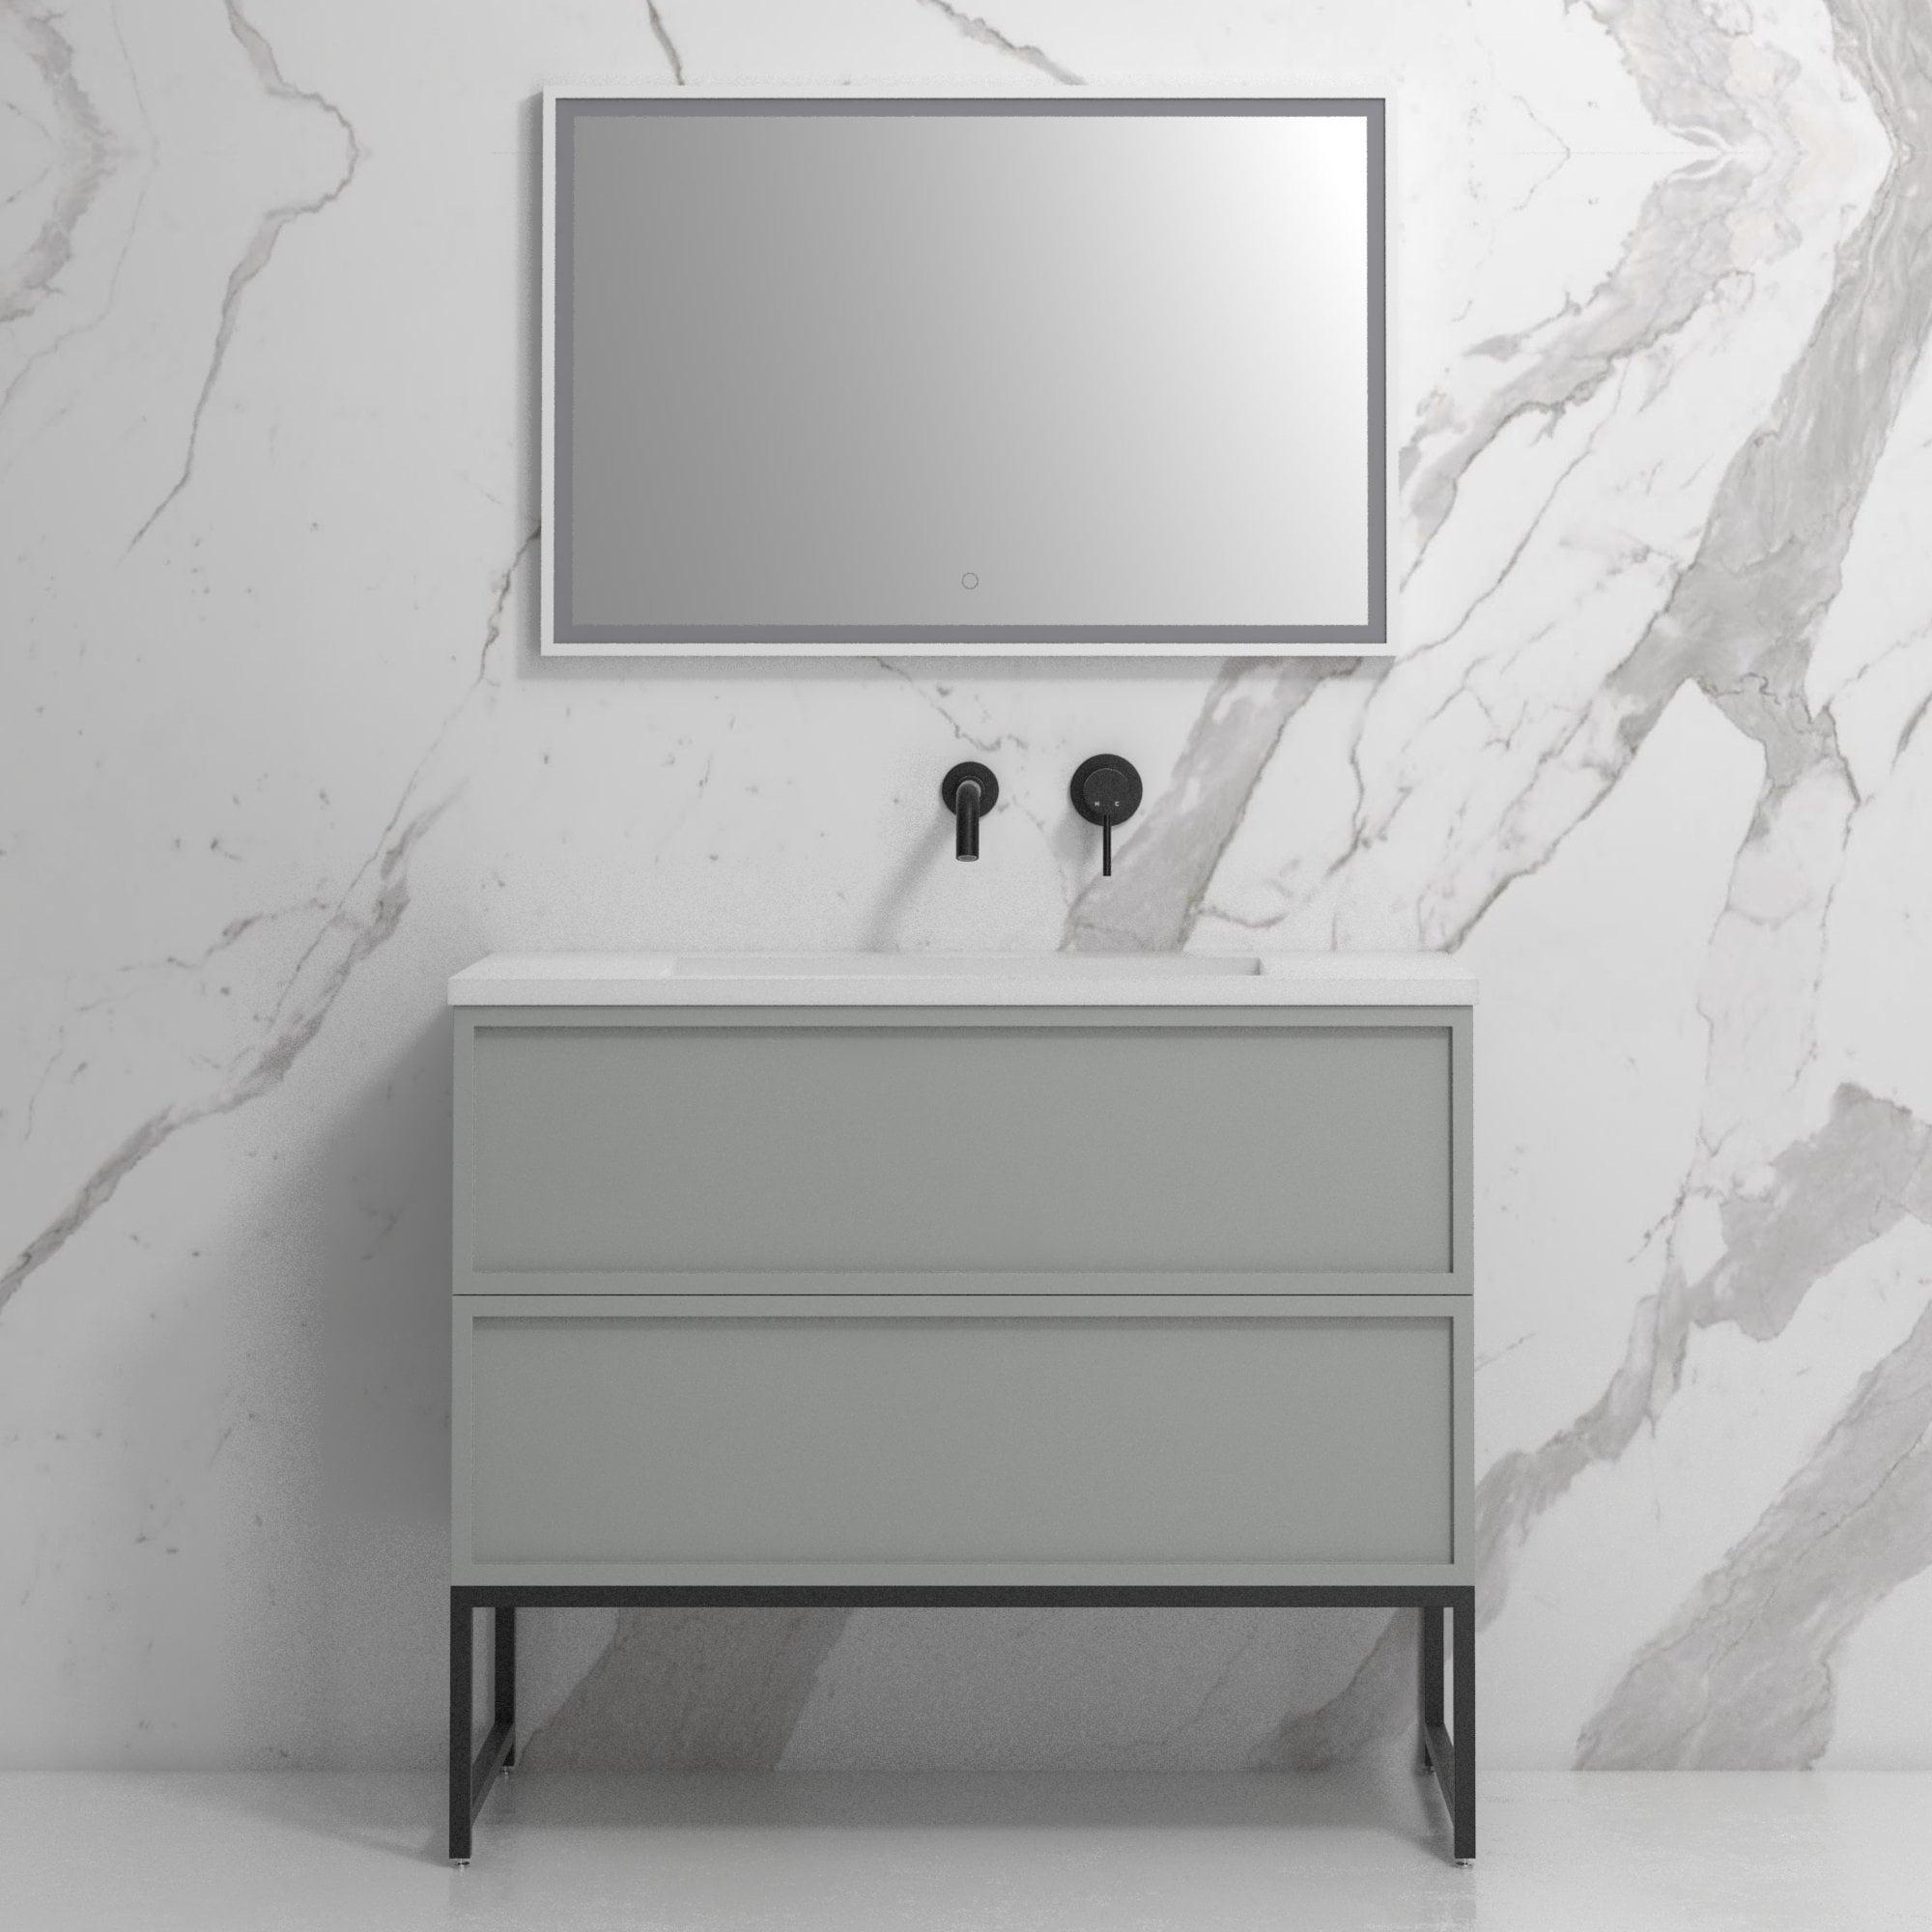 Lusso Piana 1000 Matte Grey And Black Steel Framed